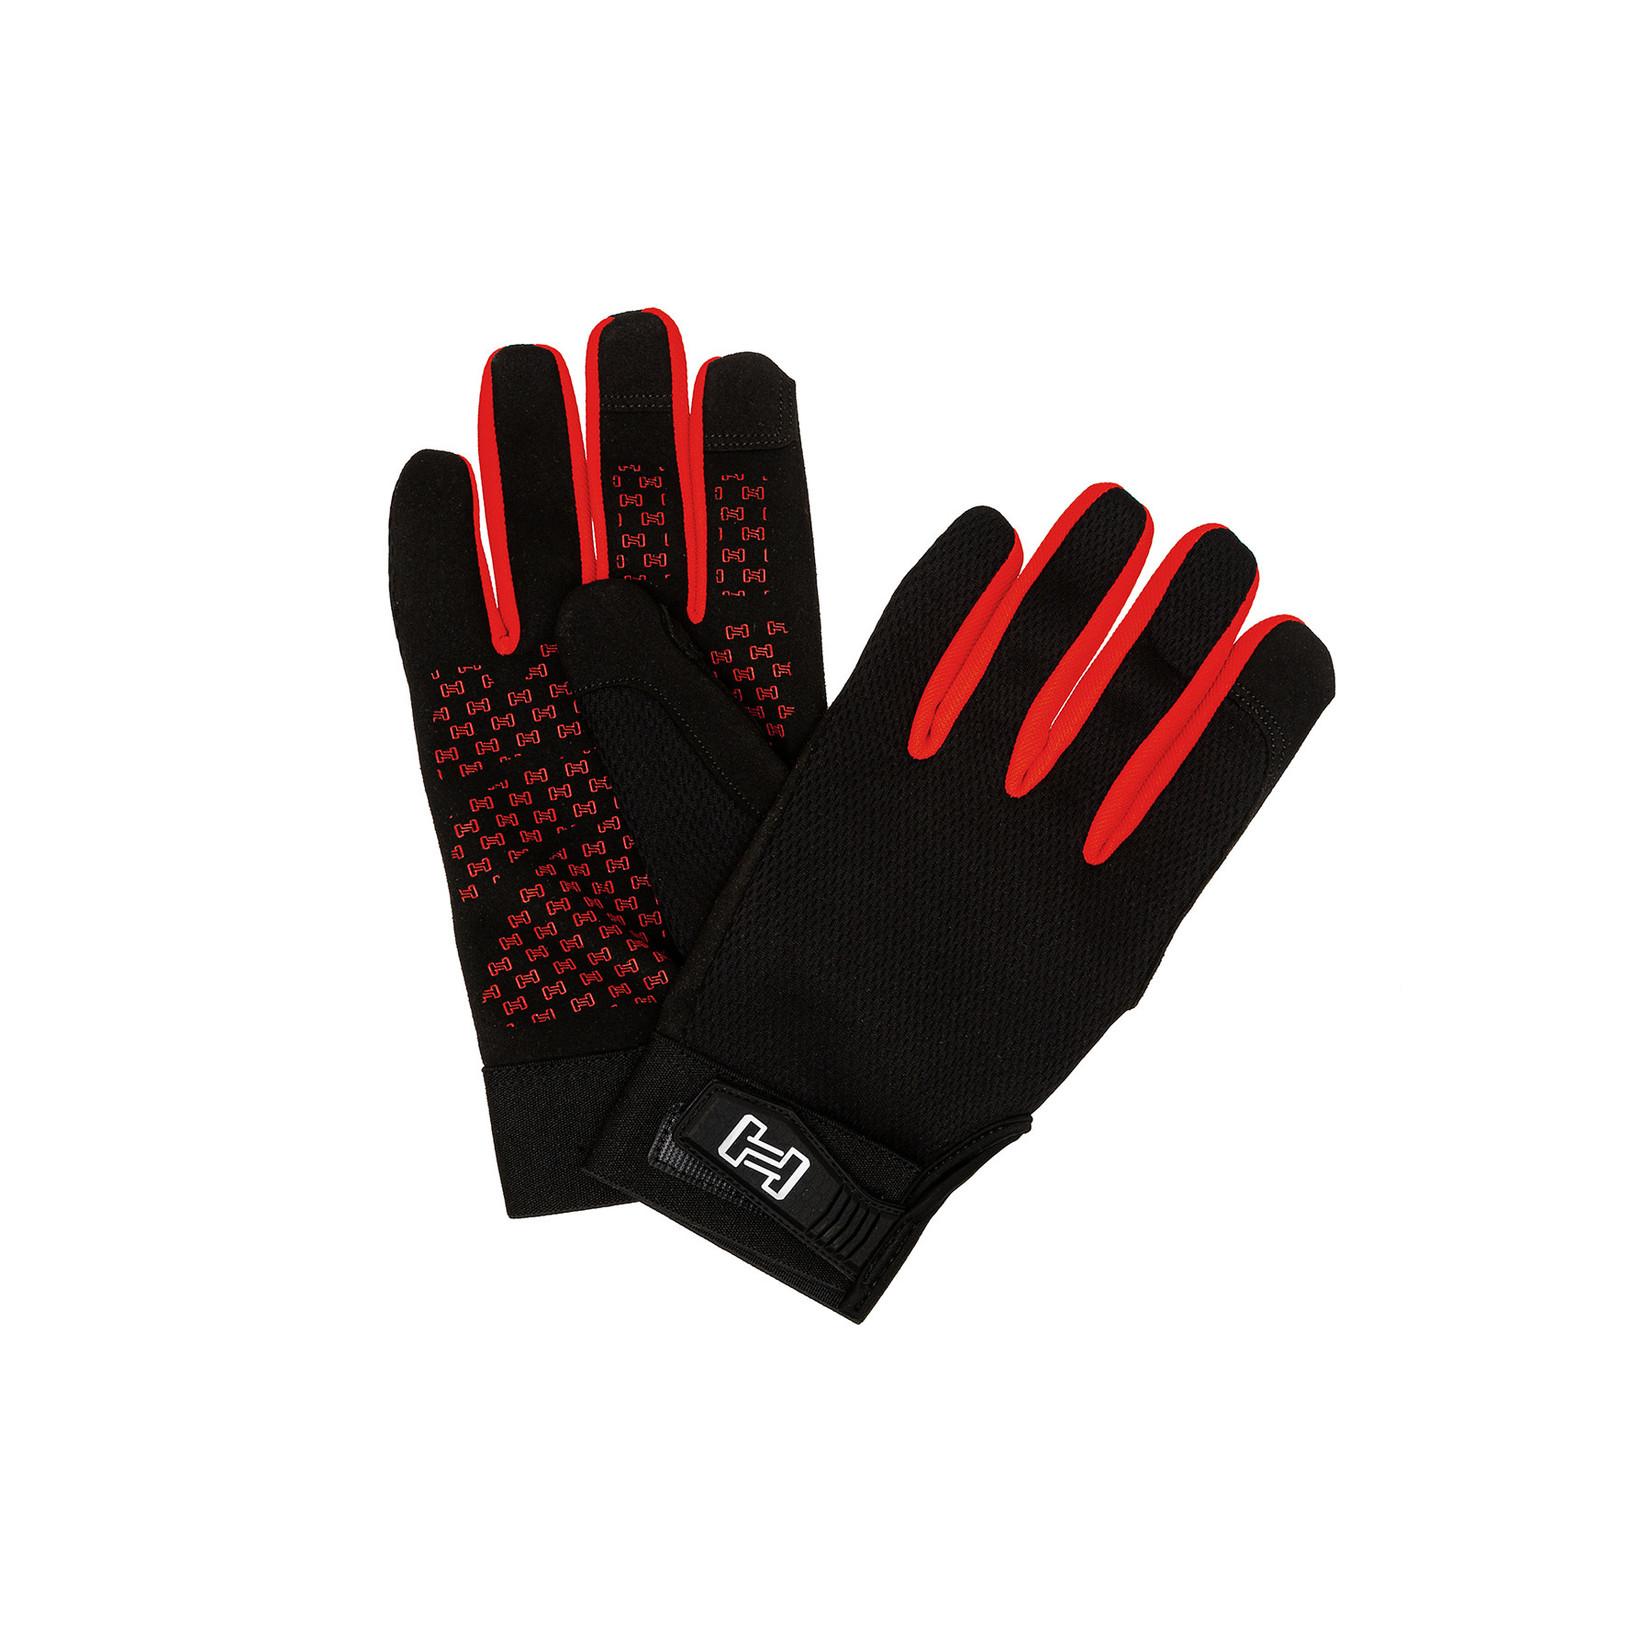 Hosa Hosa A/V Work Gloves (Medium)